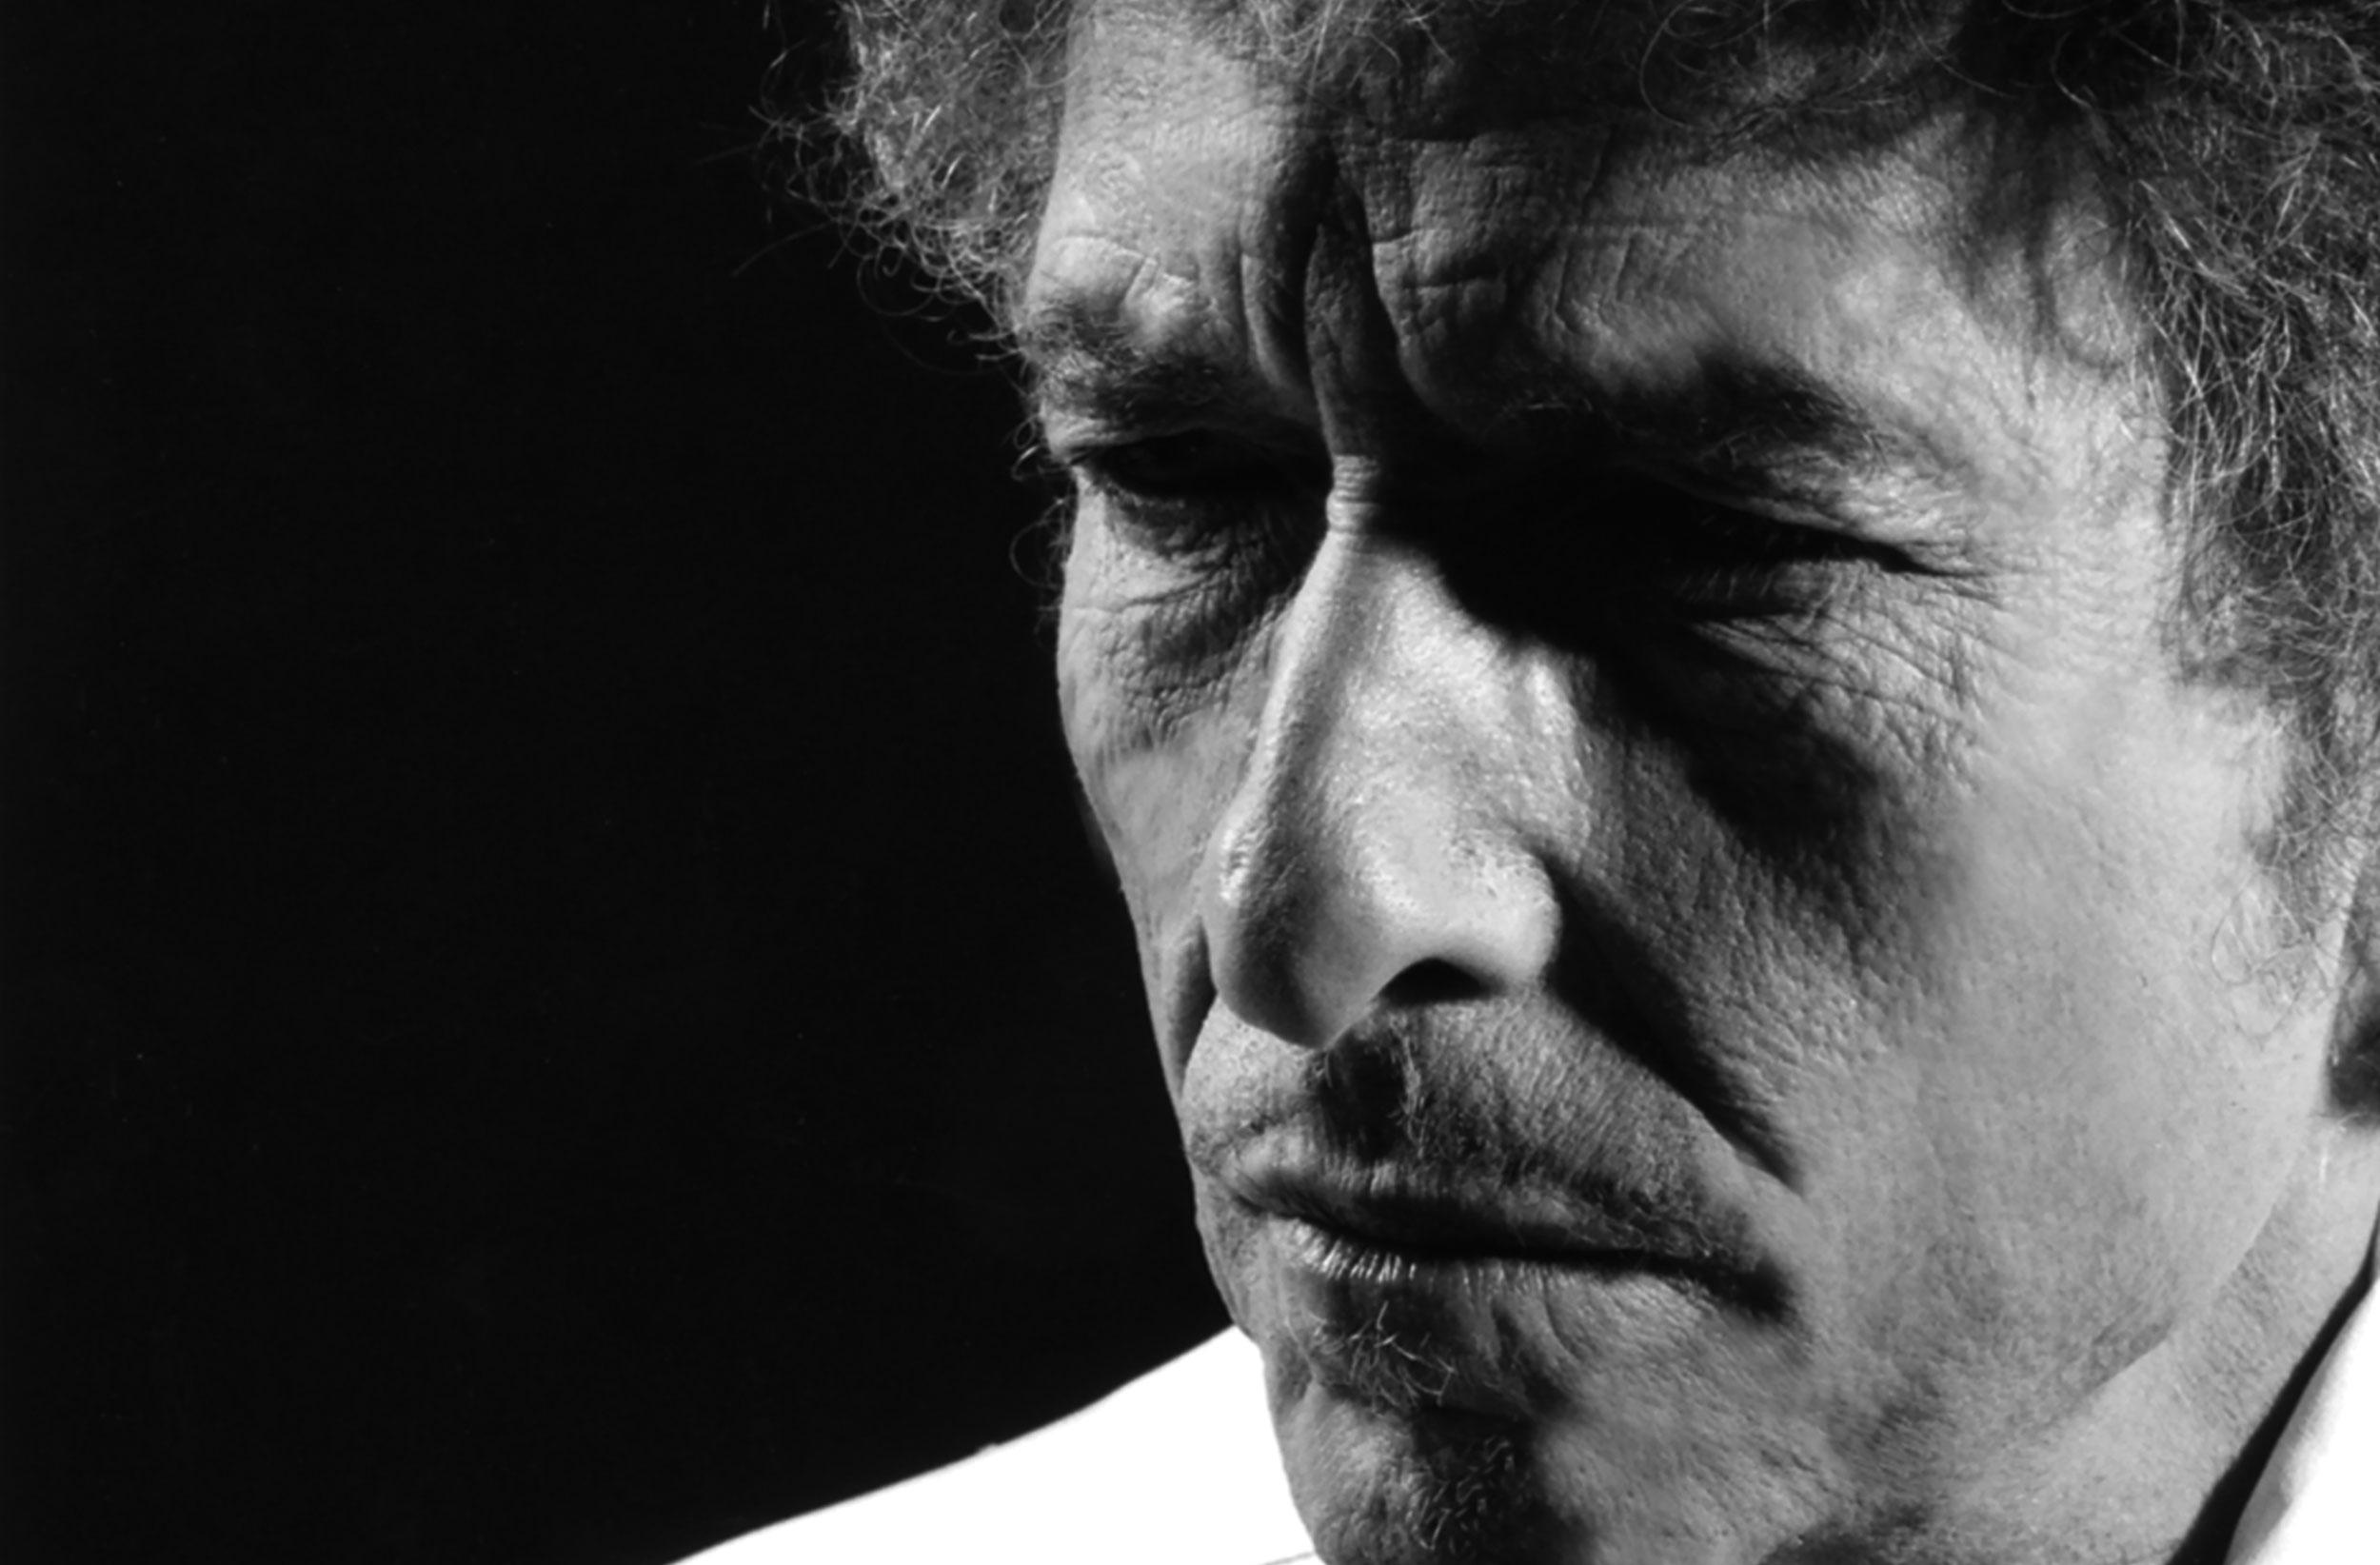 Bob Dylan, Rough and Rowdy Ways